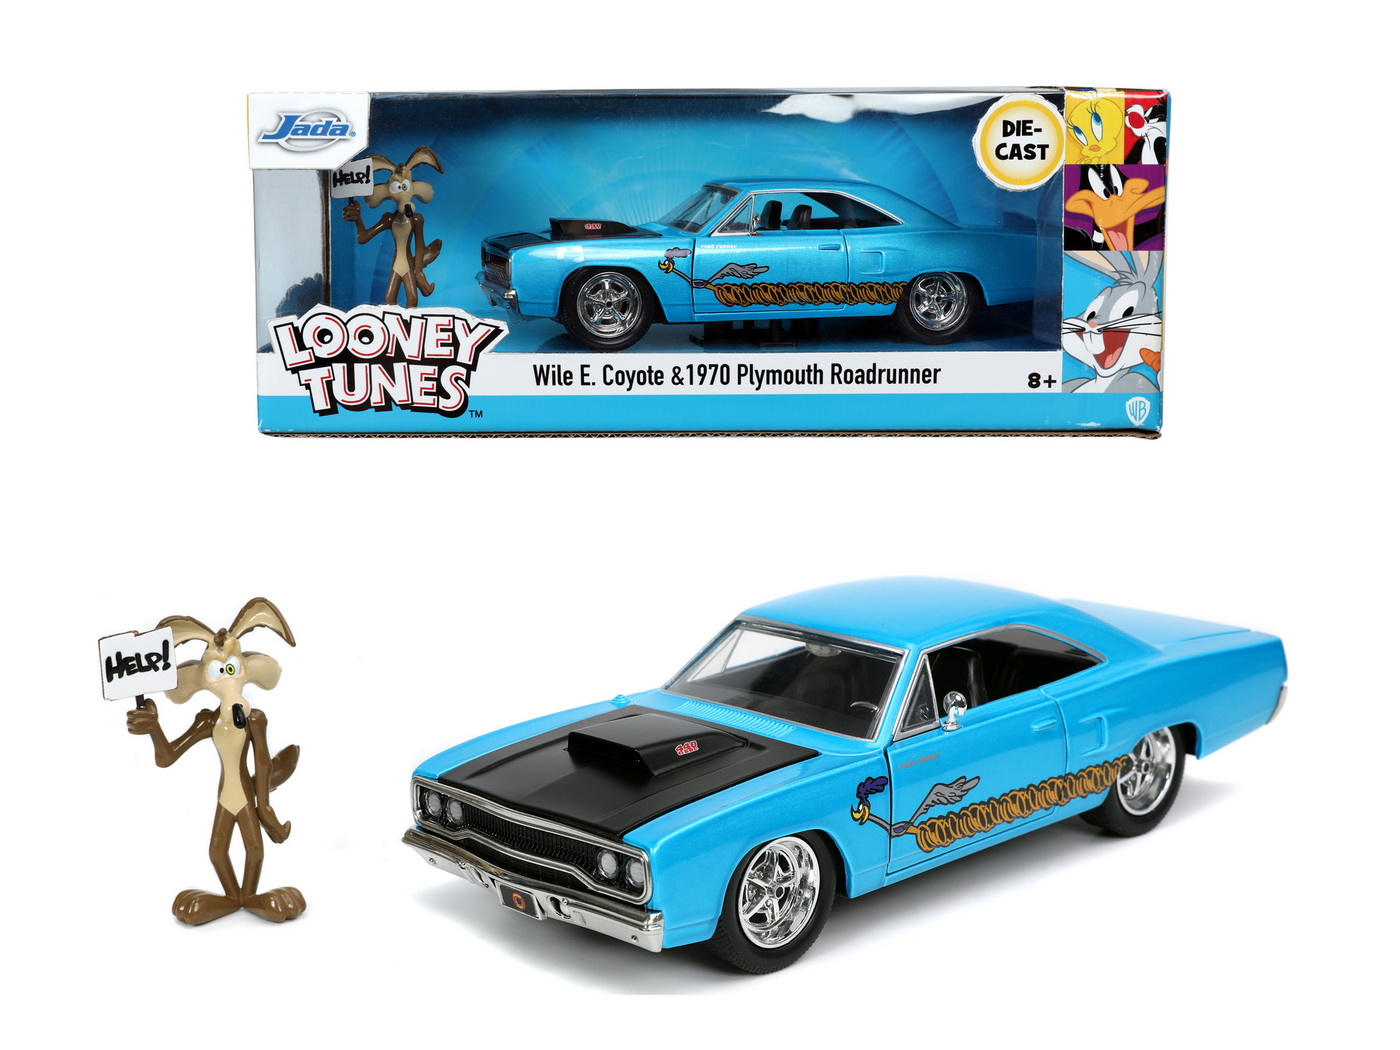 Looney Tunes Road Runner Set Masinuta Metalica  1970 Plymouth Scara 1:24 Si Figurina Wile E Coyote